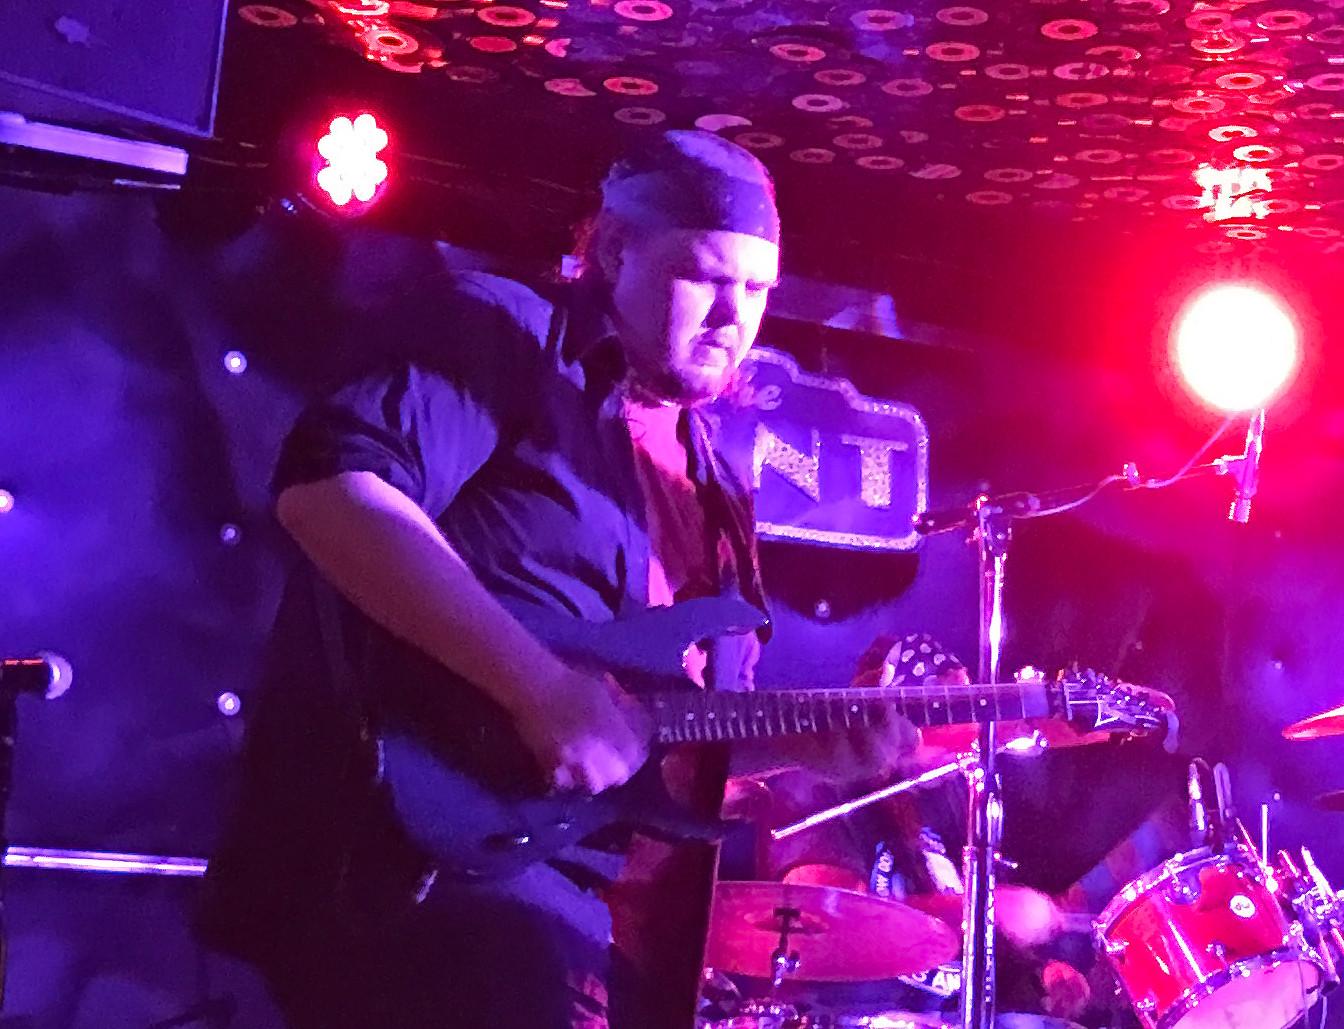 JMH on Guitar @ The Mint LA